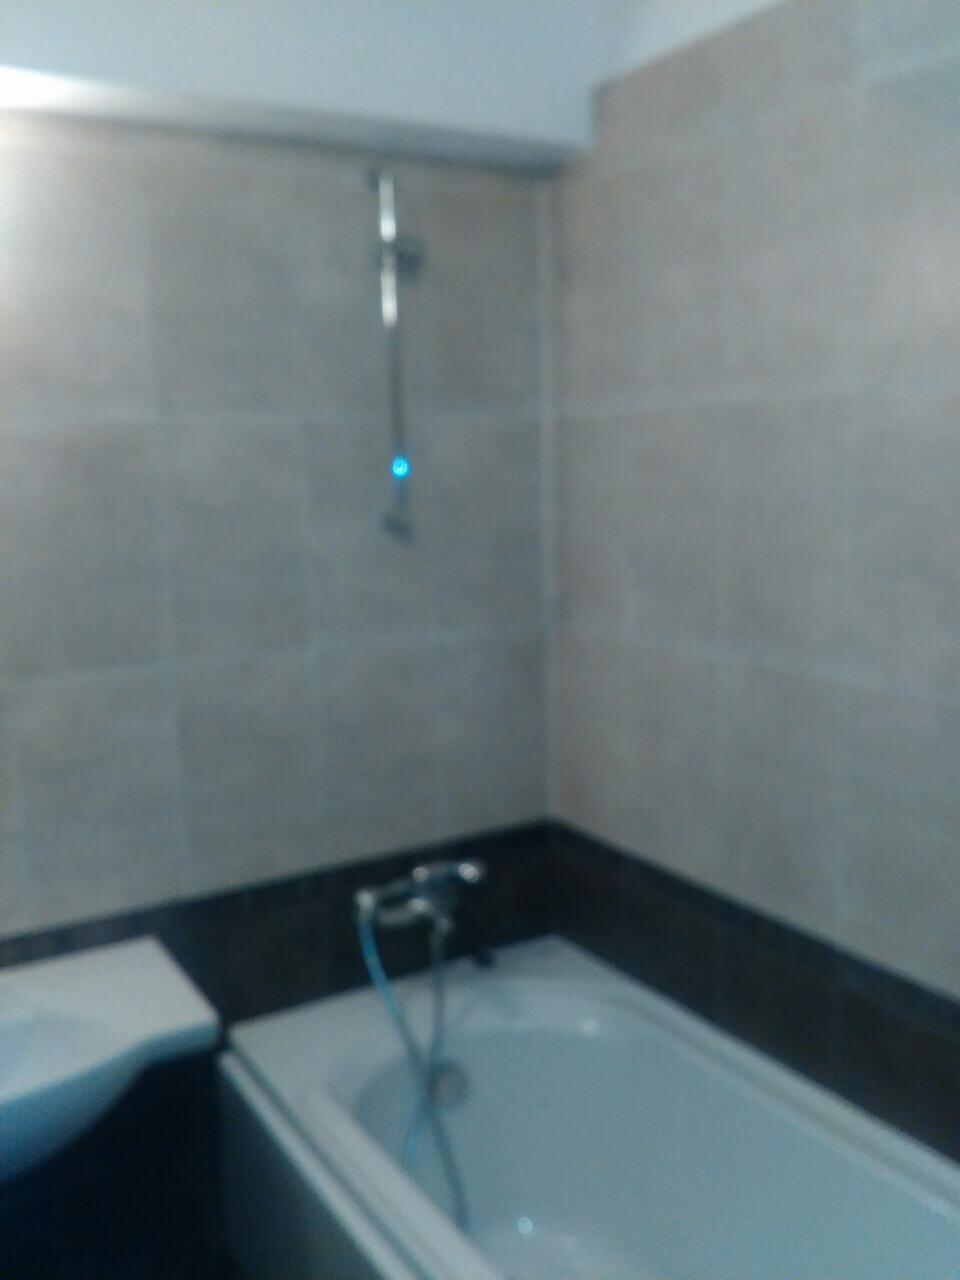 1539859556-sell-property-img_2348.JPG